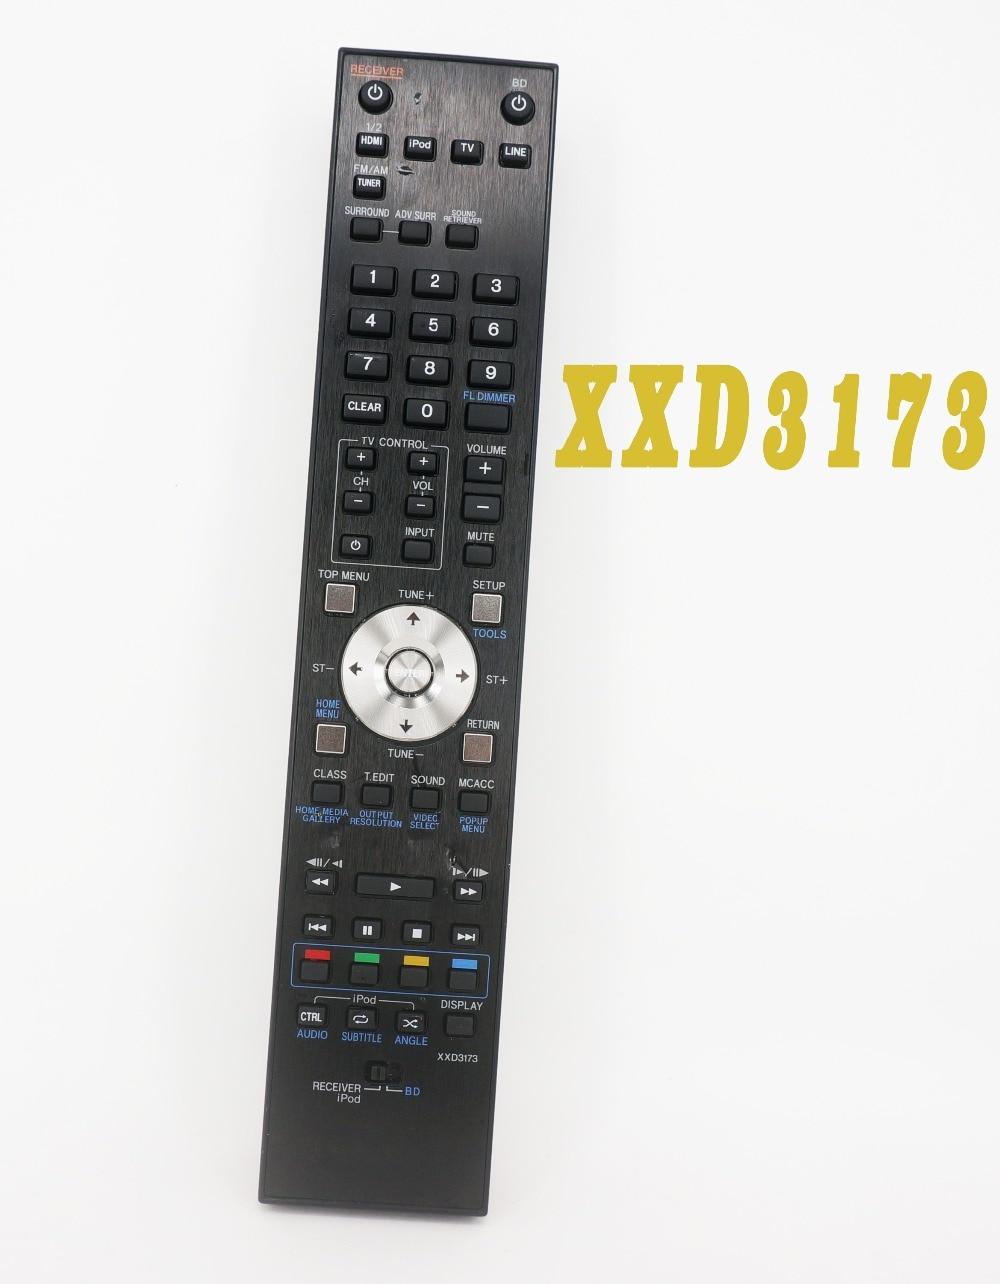 Used Original Remote Control XXD3173 FOR Pioneer Blu-Ray LX Series BD Surround Receiver blu ray плеер pioneer bdp 180 k black